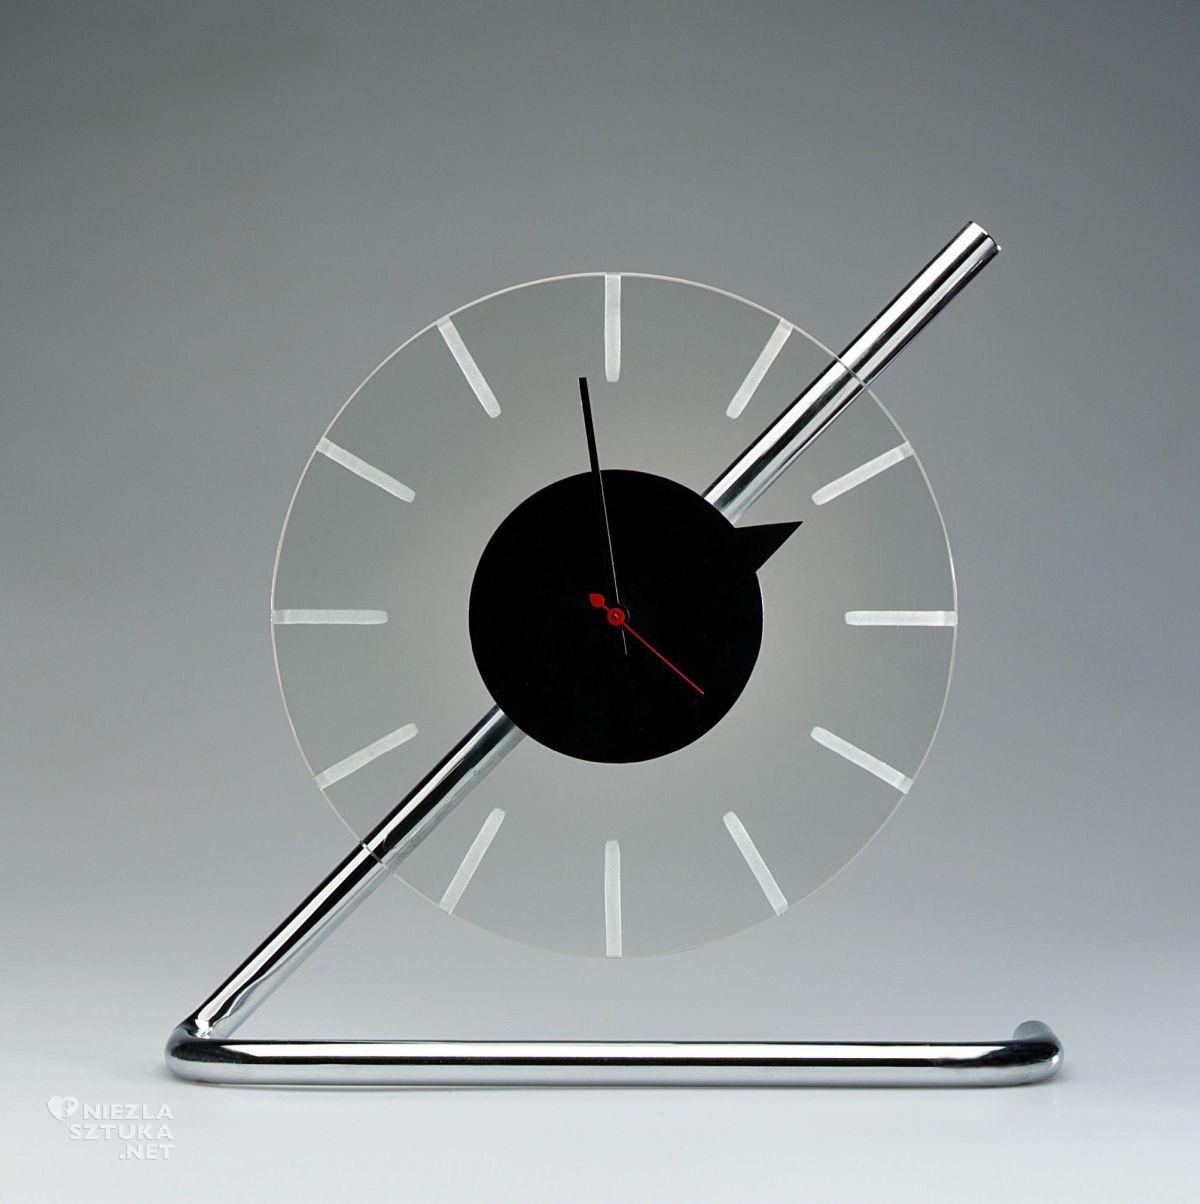 Gilbert Rohde, Electric clock, art deco, sztuka użytkowa, niezła sztuka